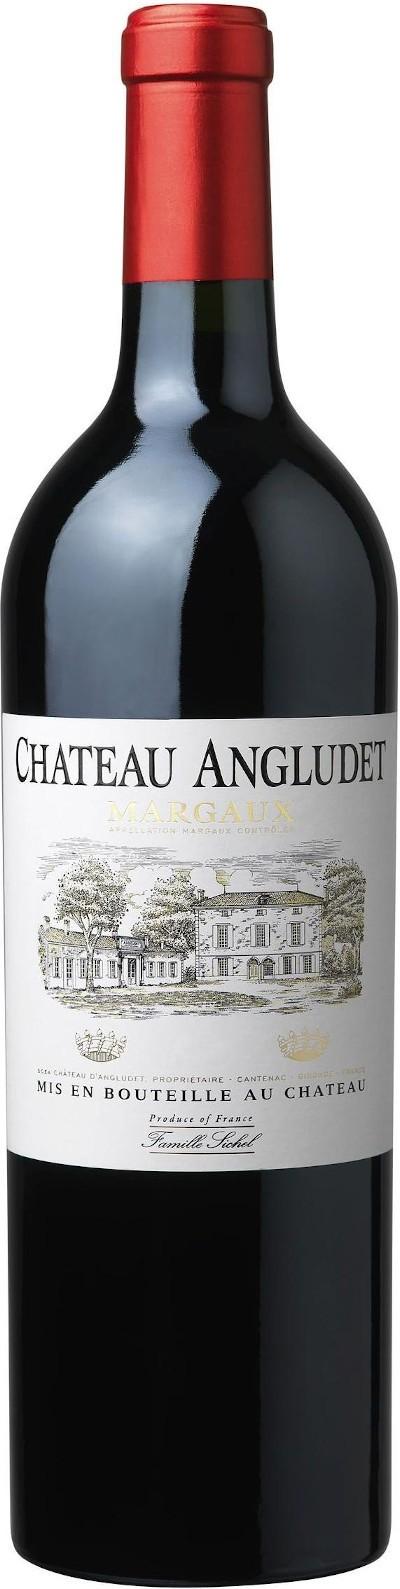 Chateau Angludet - Margaux, 2015